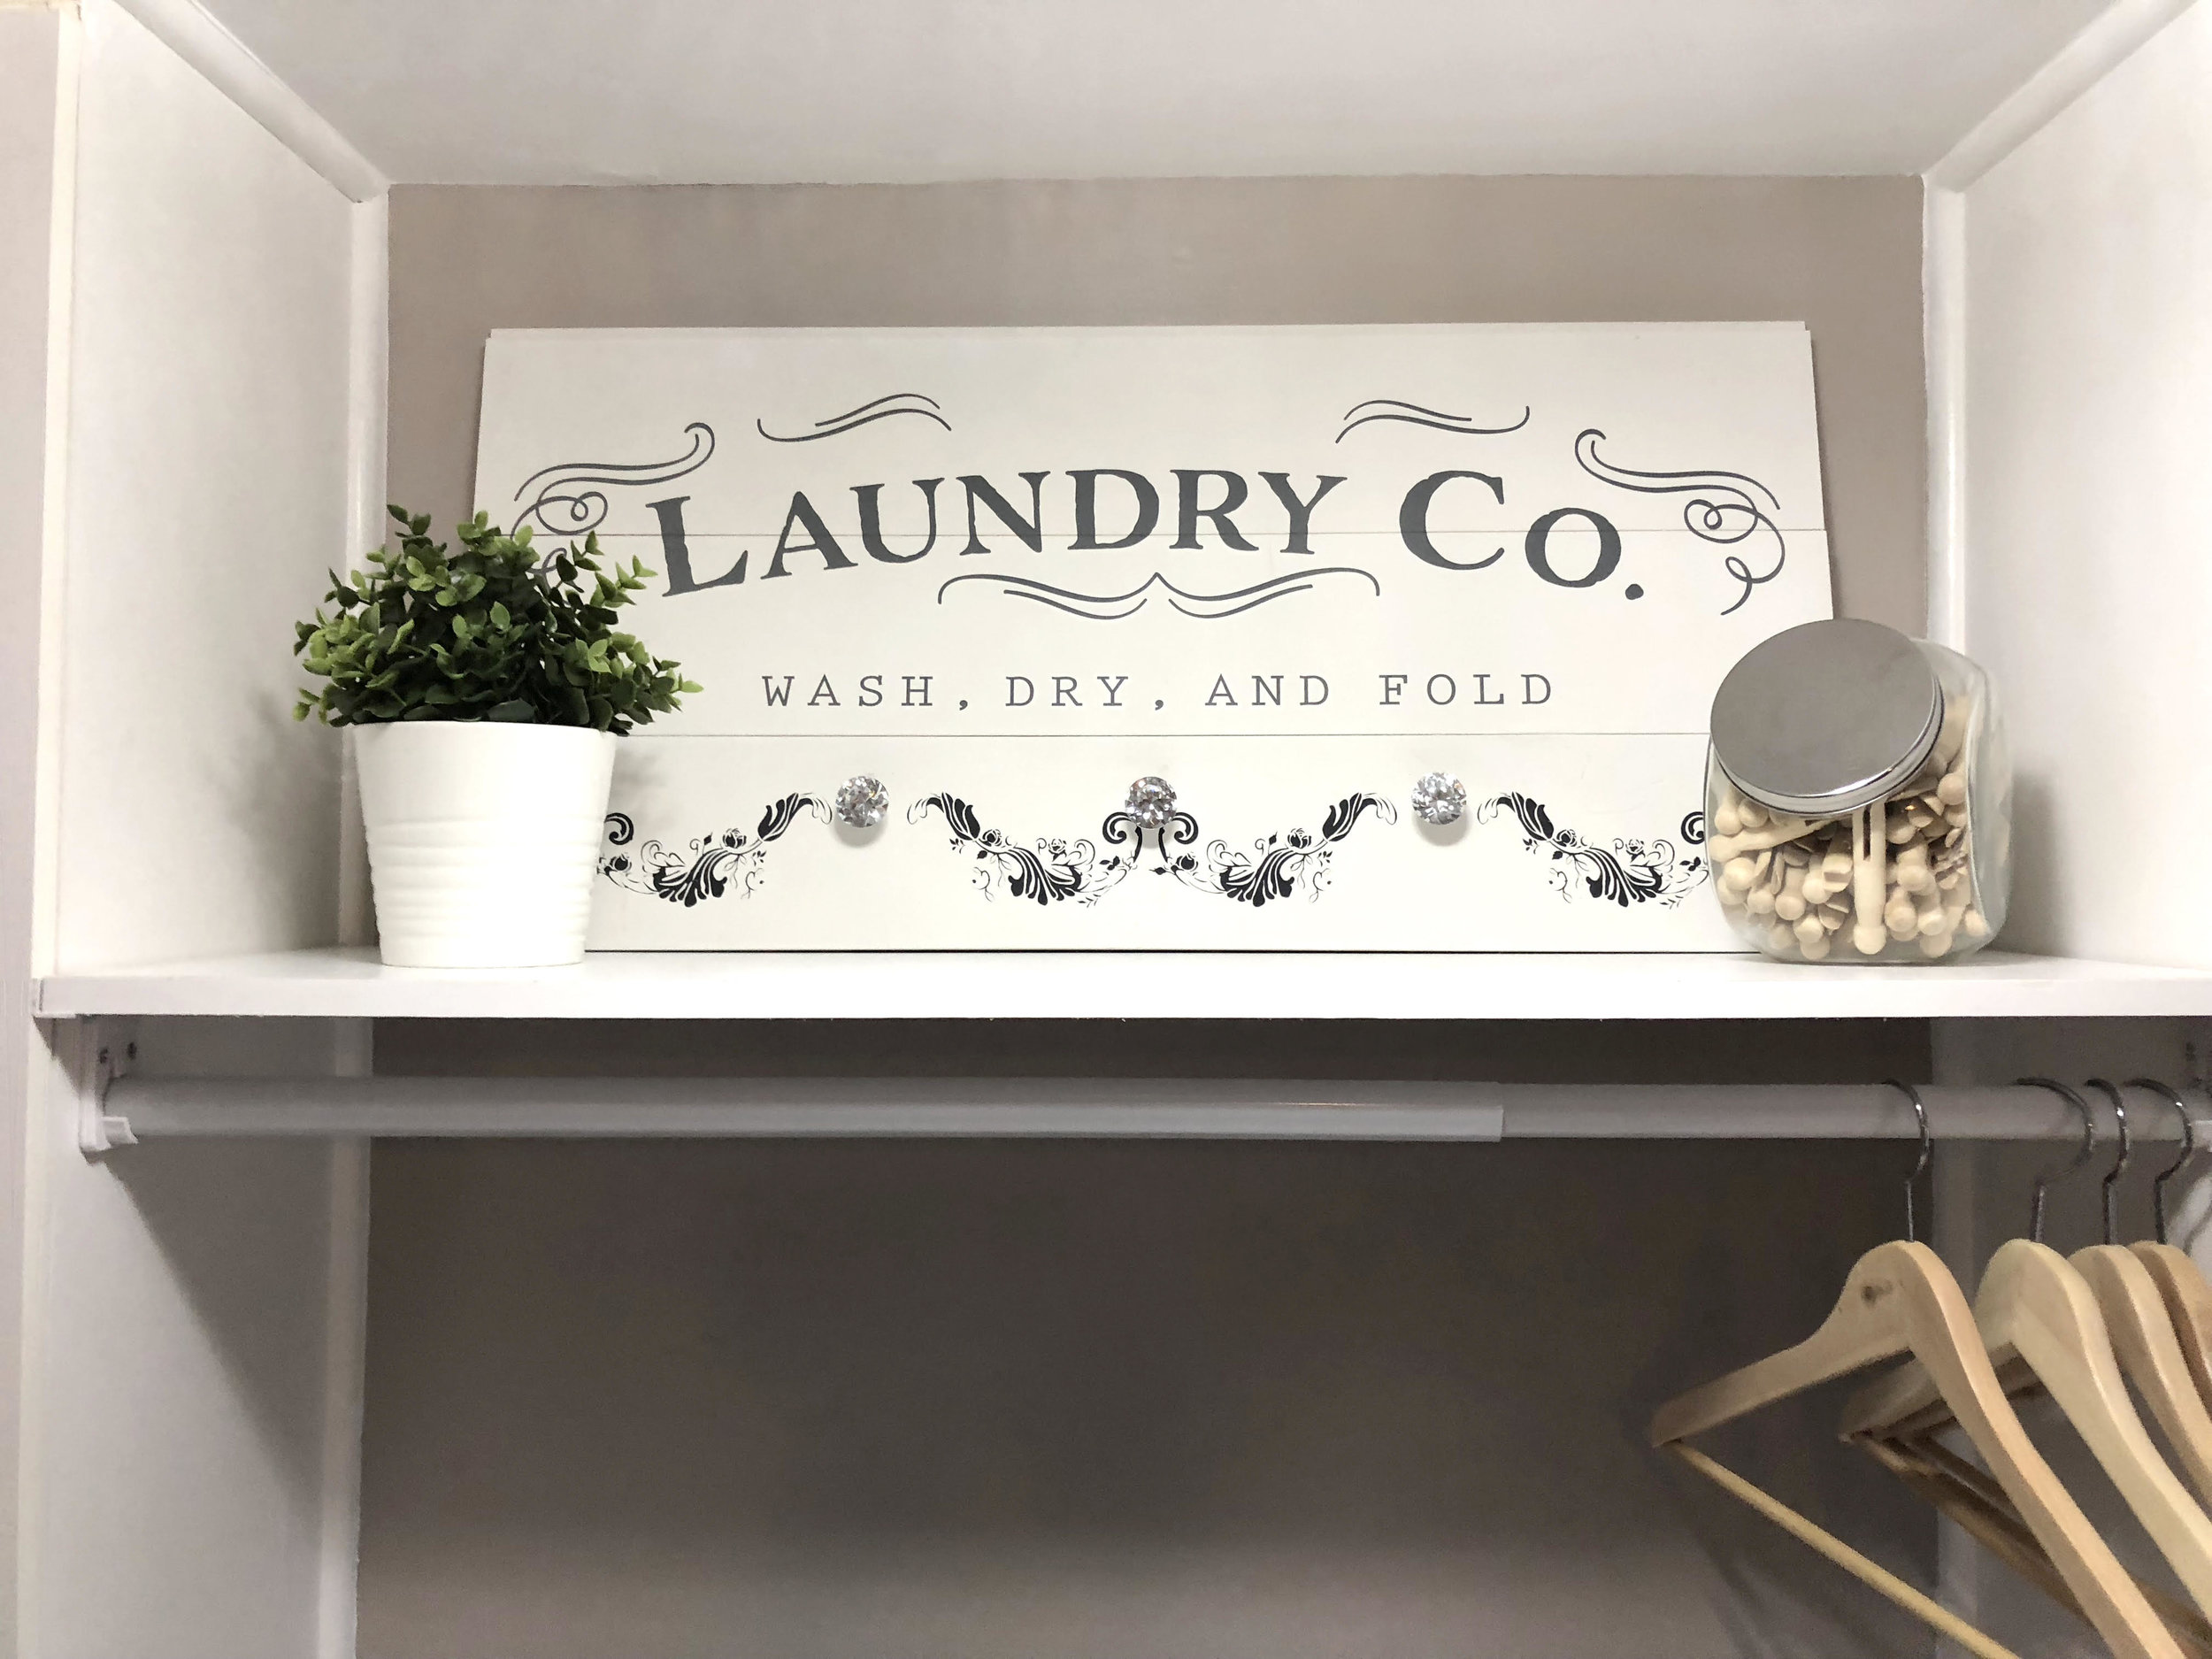 laundry11.jpg